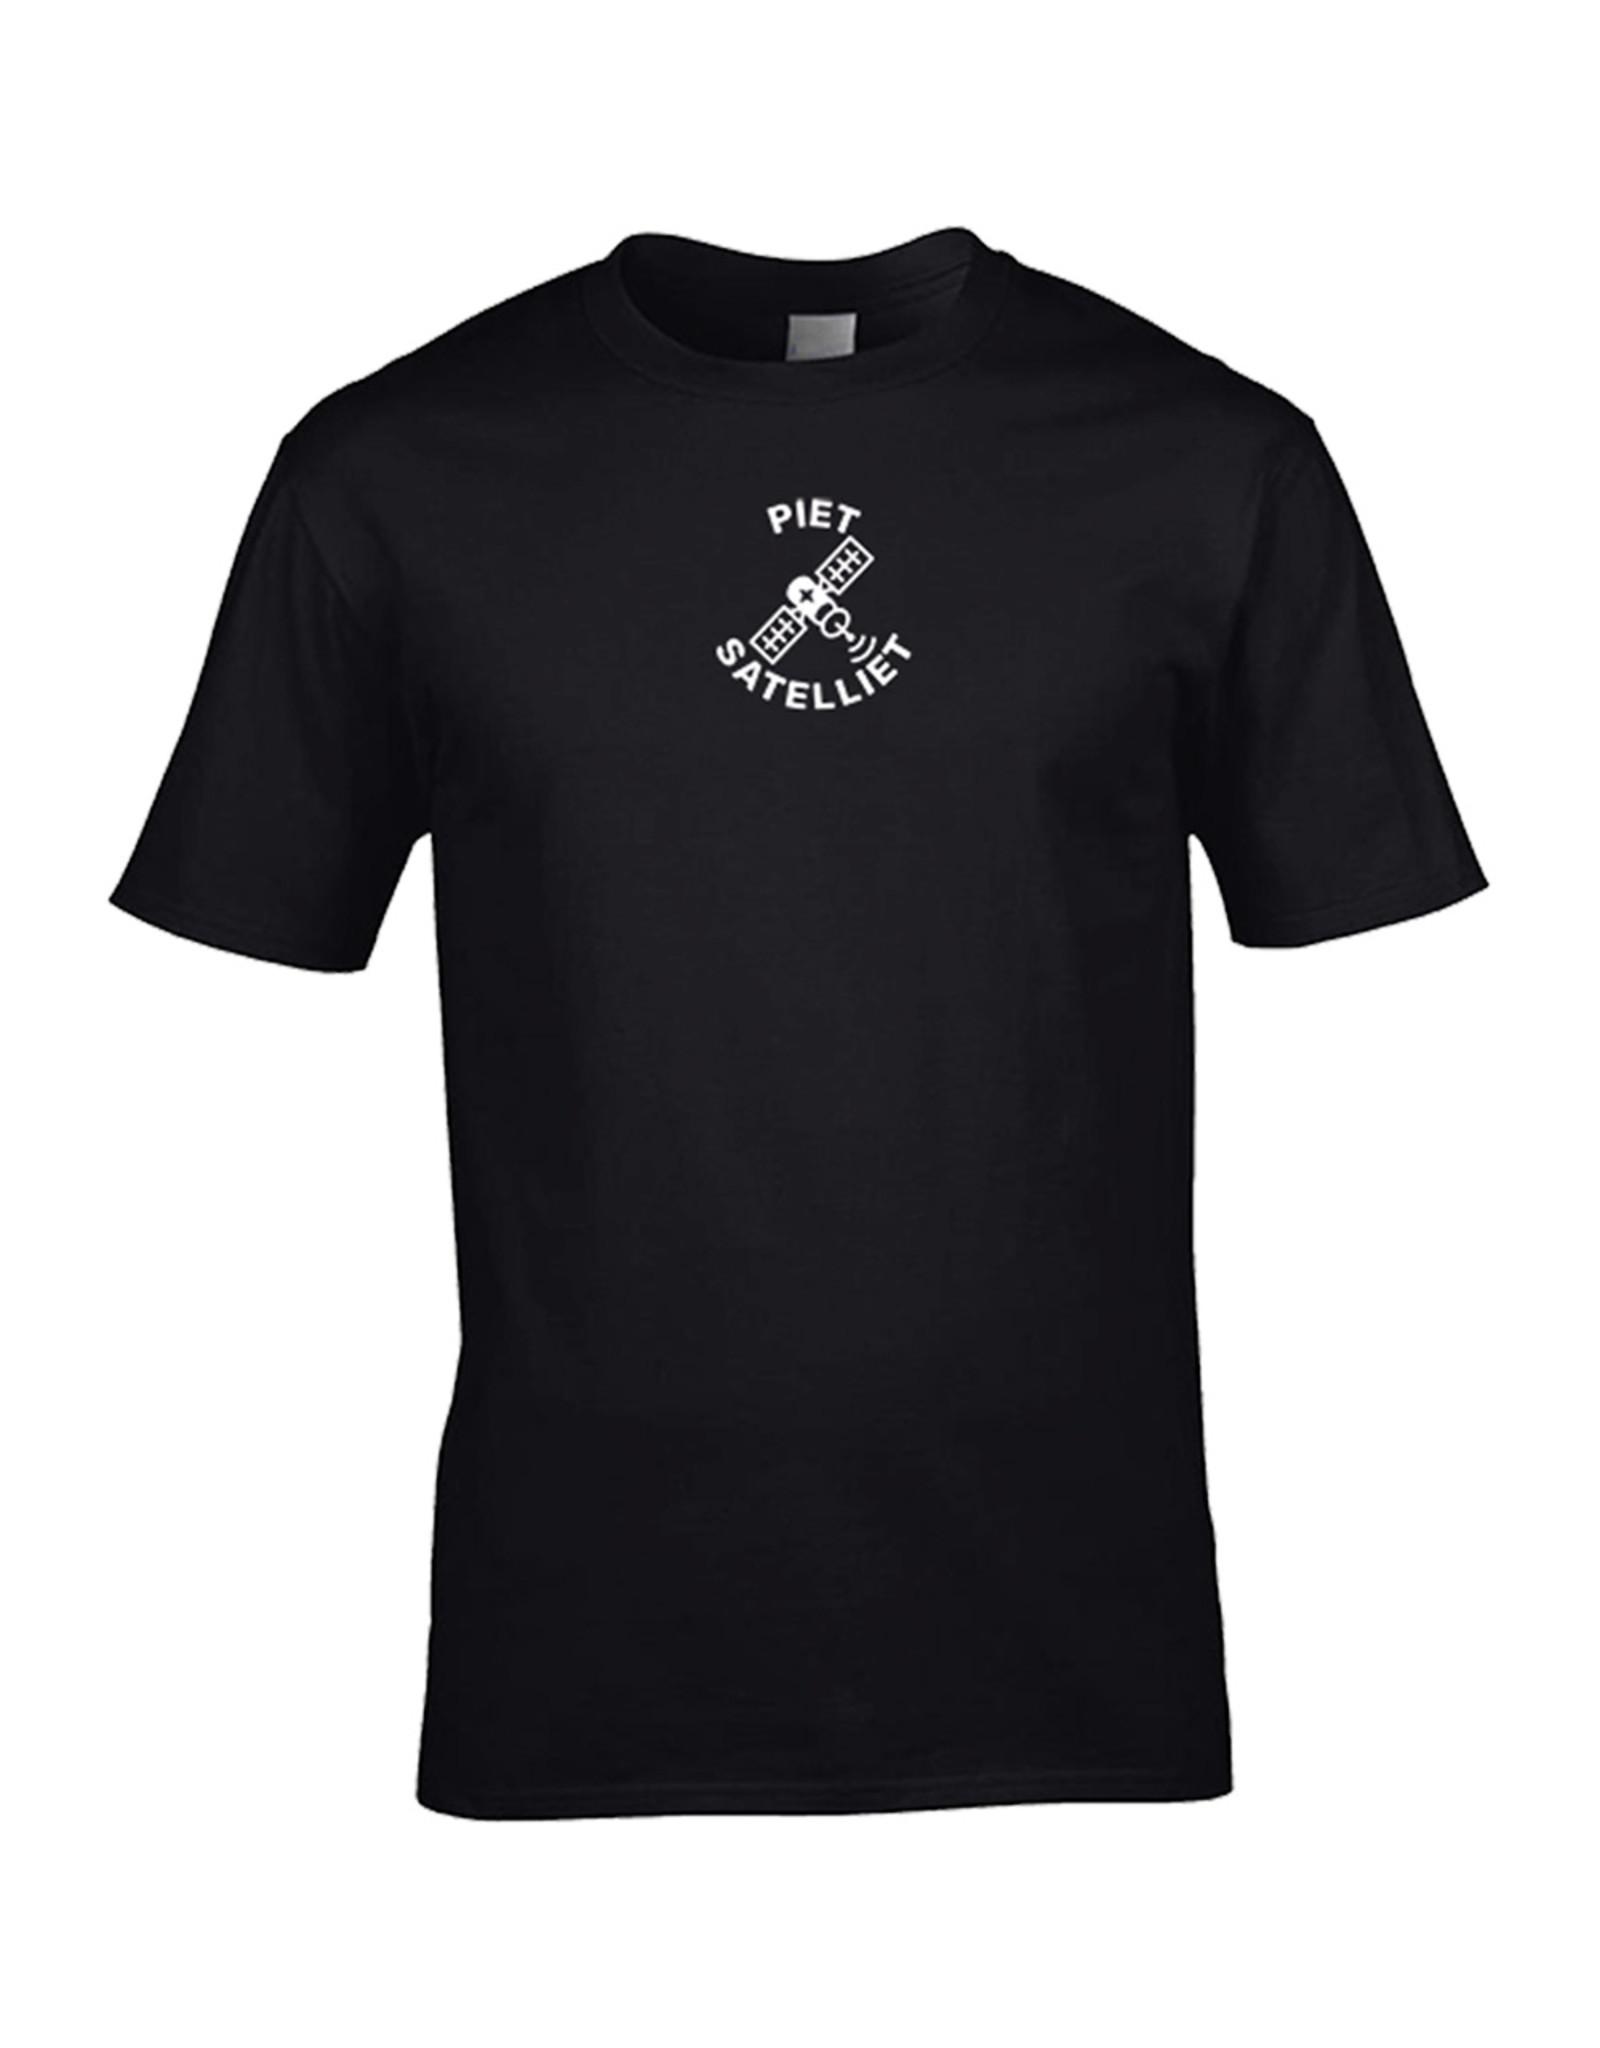 Festicap T-Shirt Piet Satelliet | Soft Cotton | Handmade by us